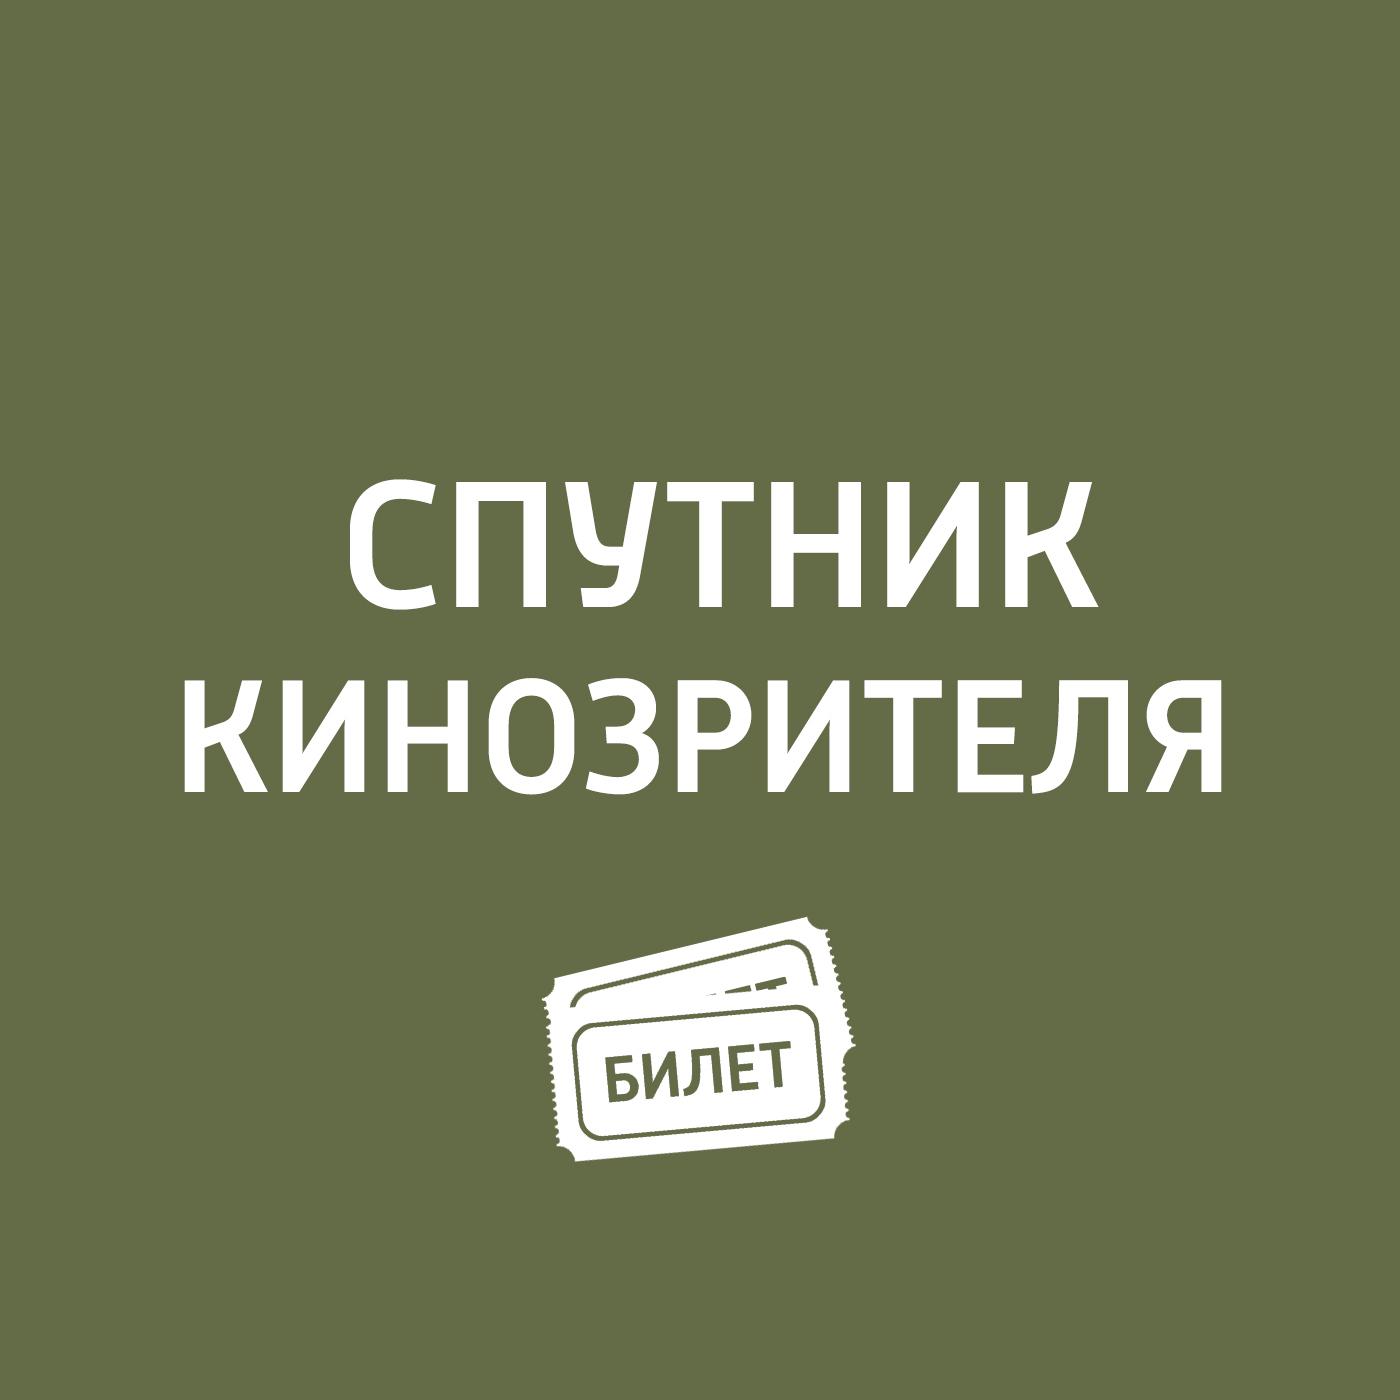 Антон Долин Битва за Севастополь, «Искатель воды mst9e19a lf